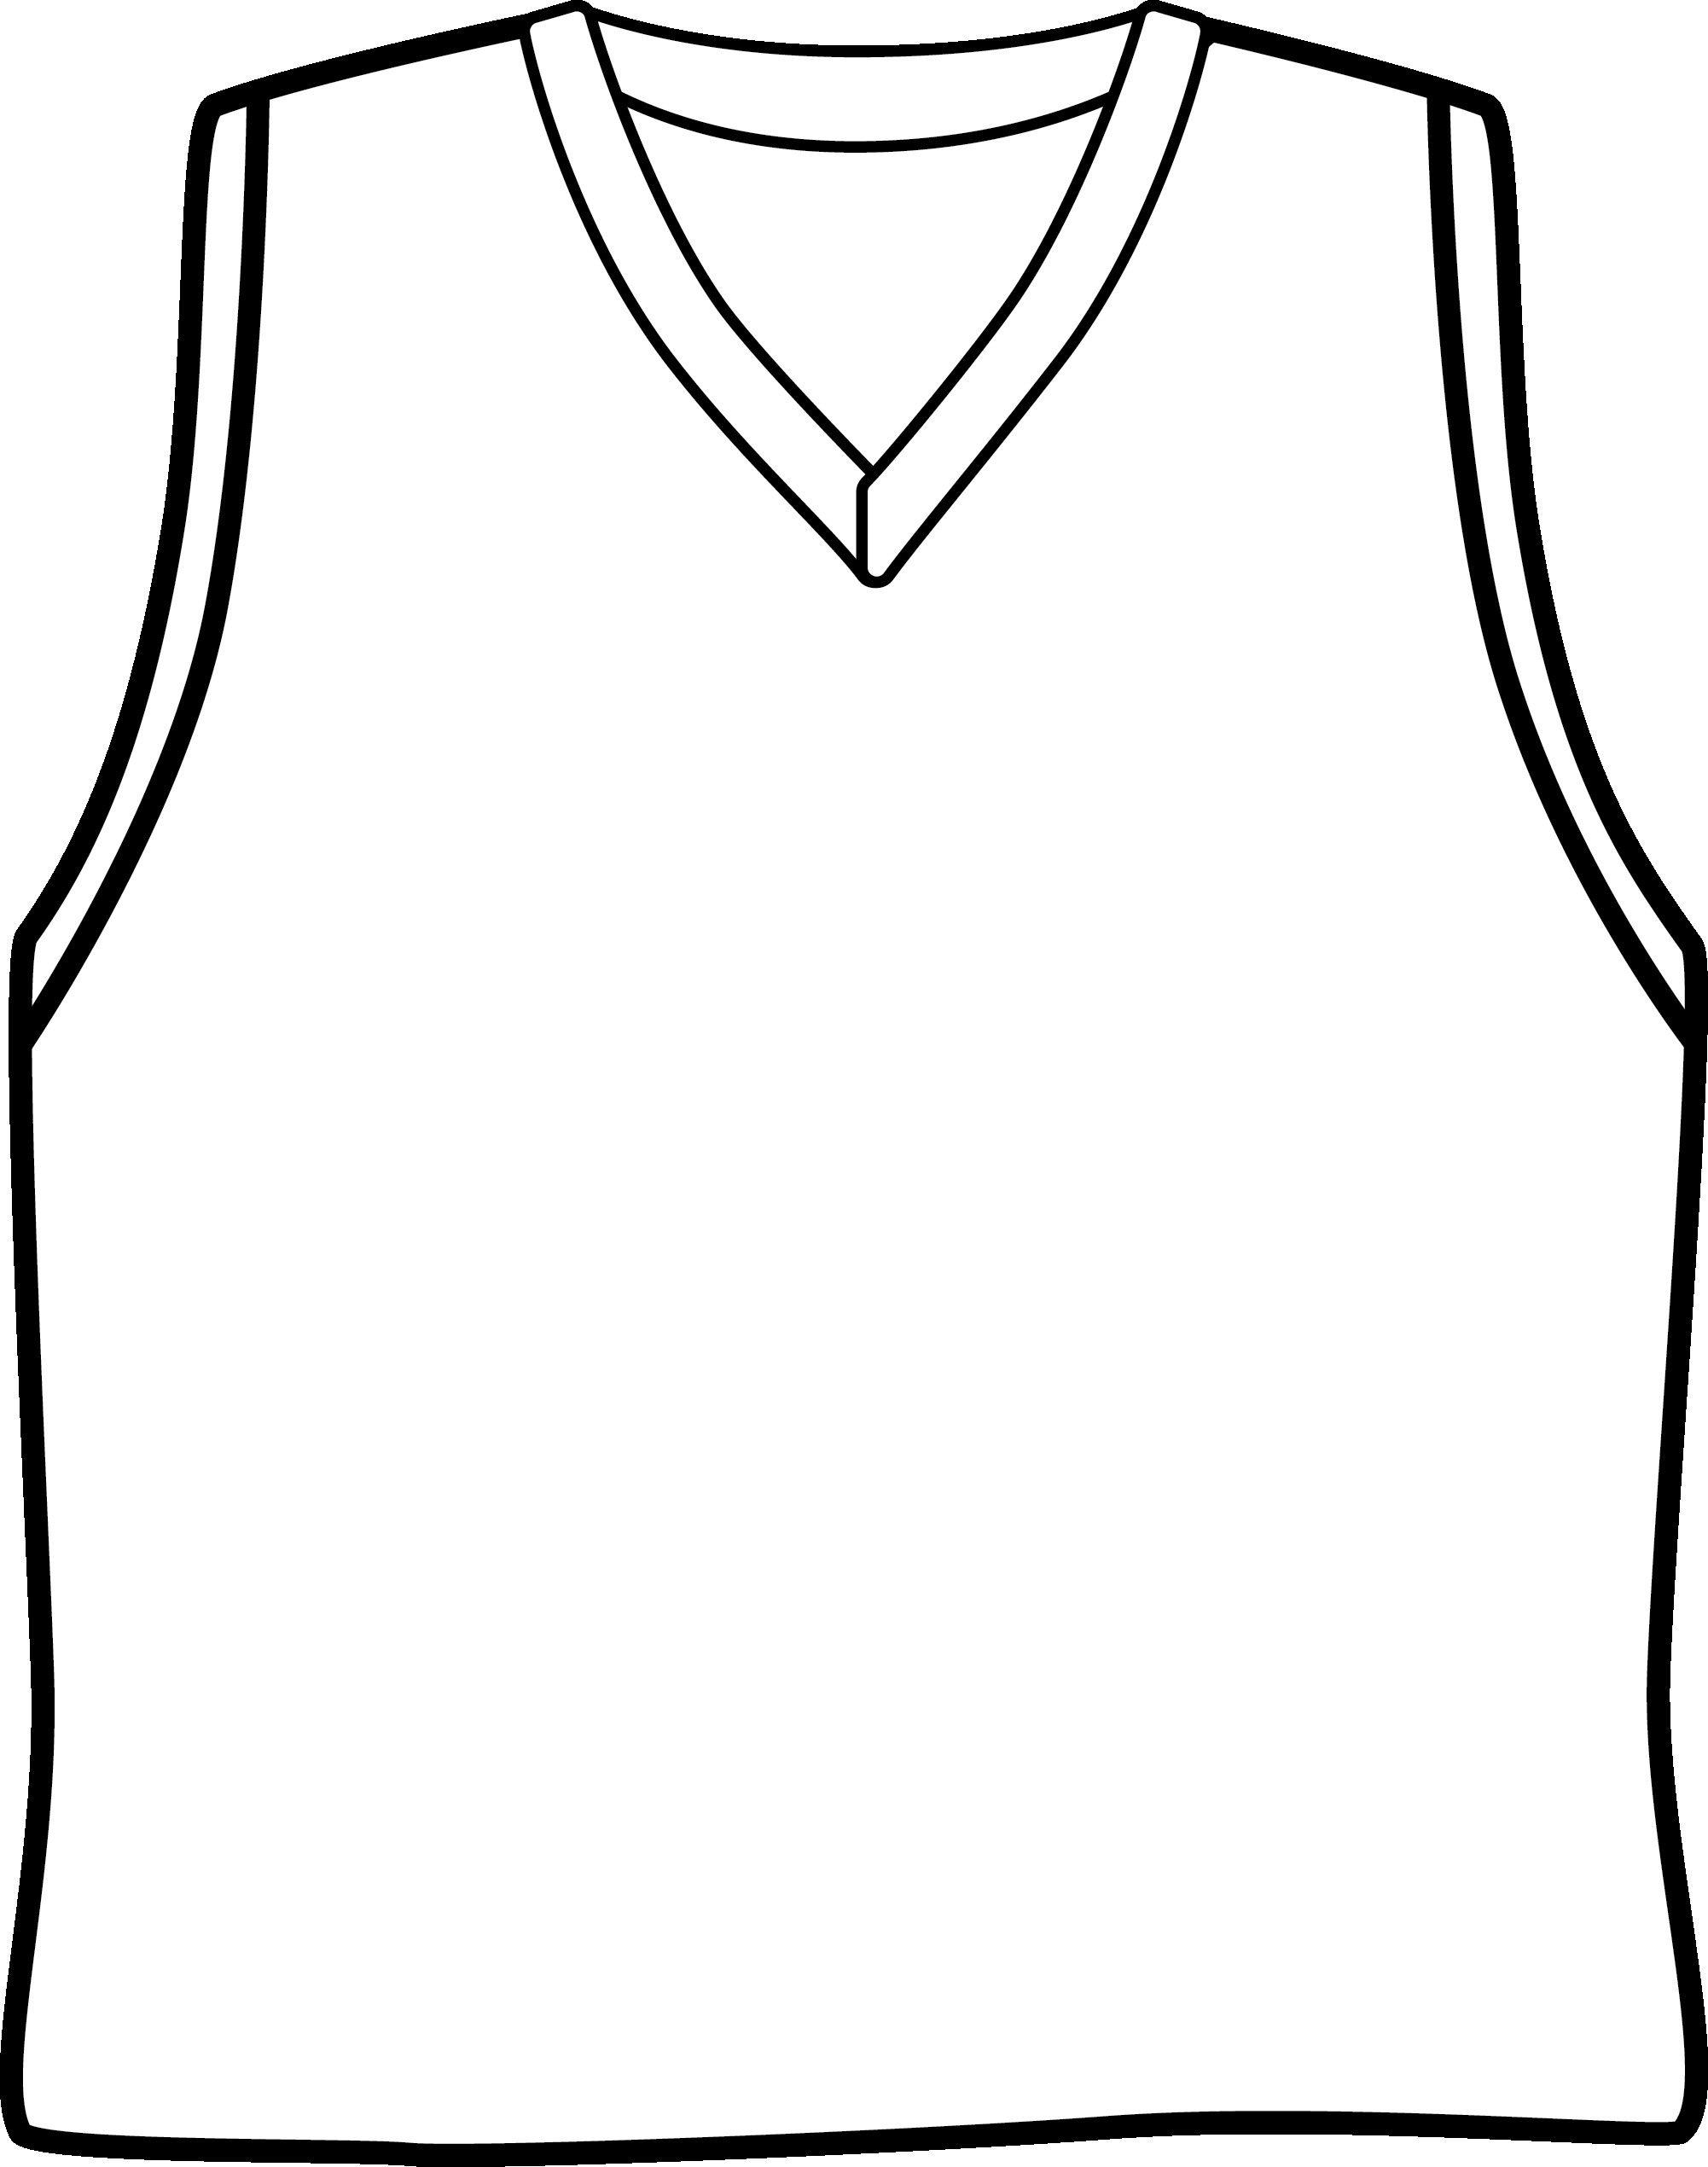 2002x2540 invitation maker basketball inspirationalnew white 2002x2540 invitation maker basketball inspirationalnew white basketball stopboris Choice Image